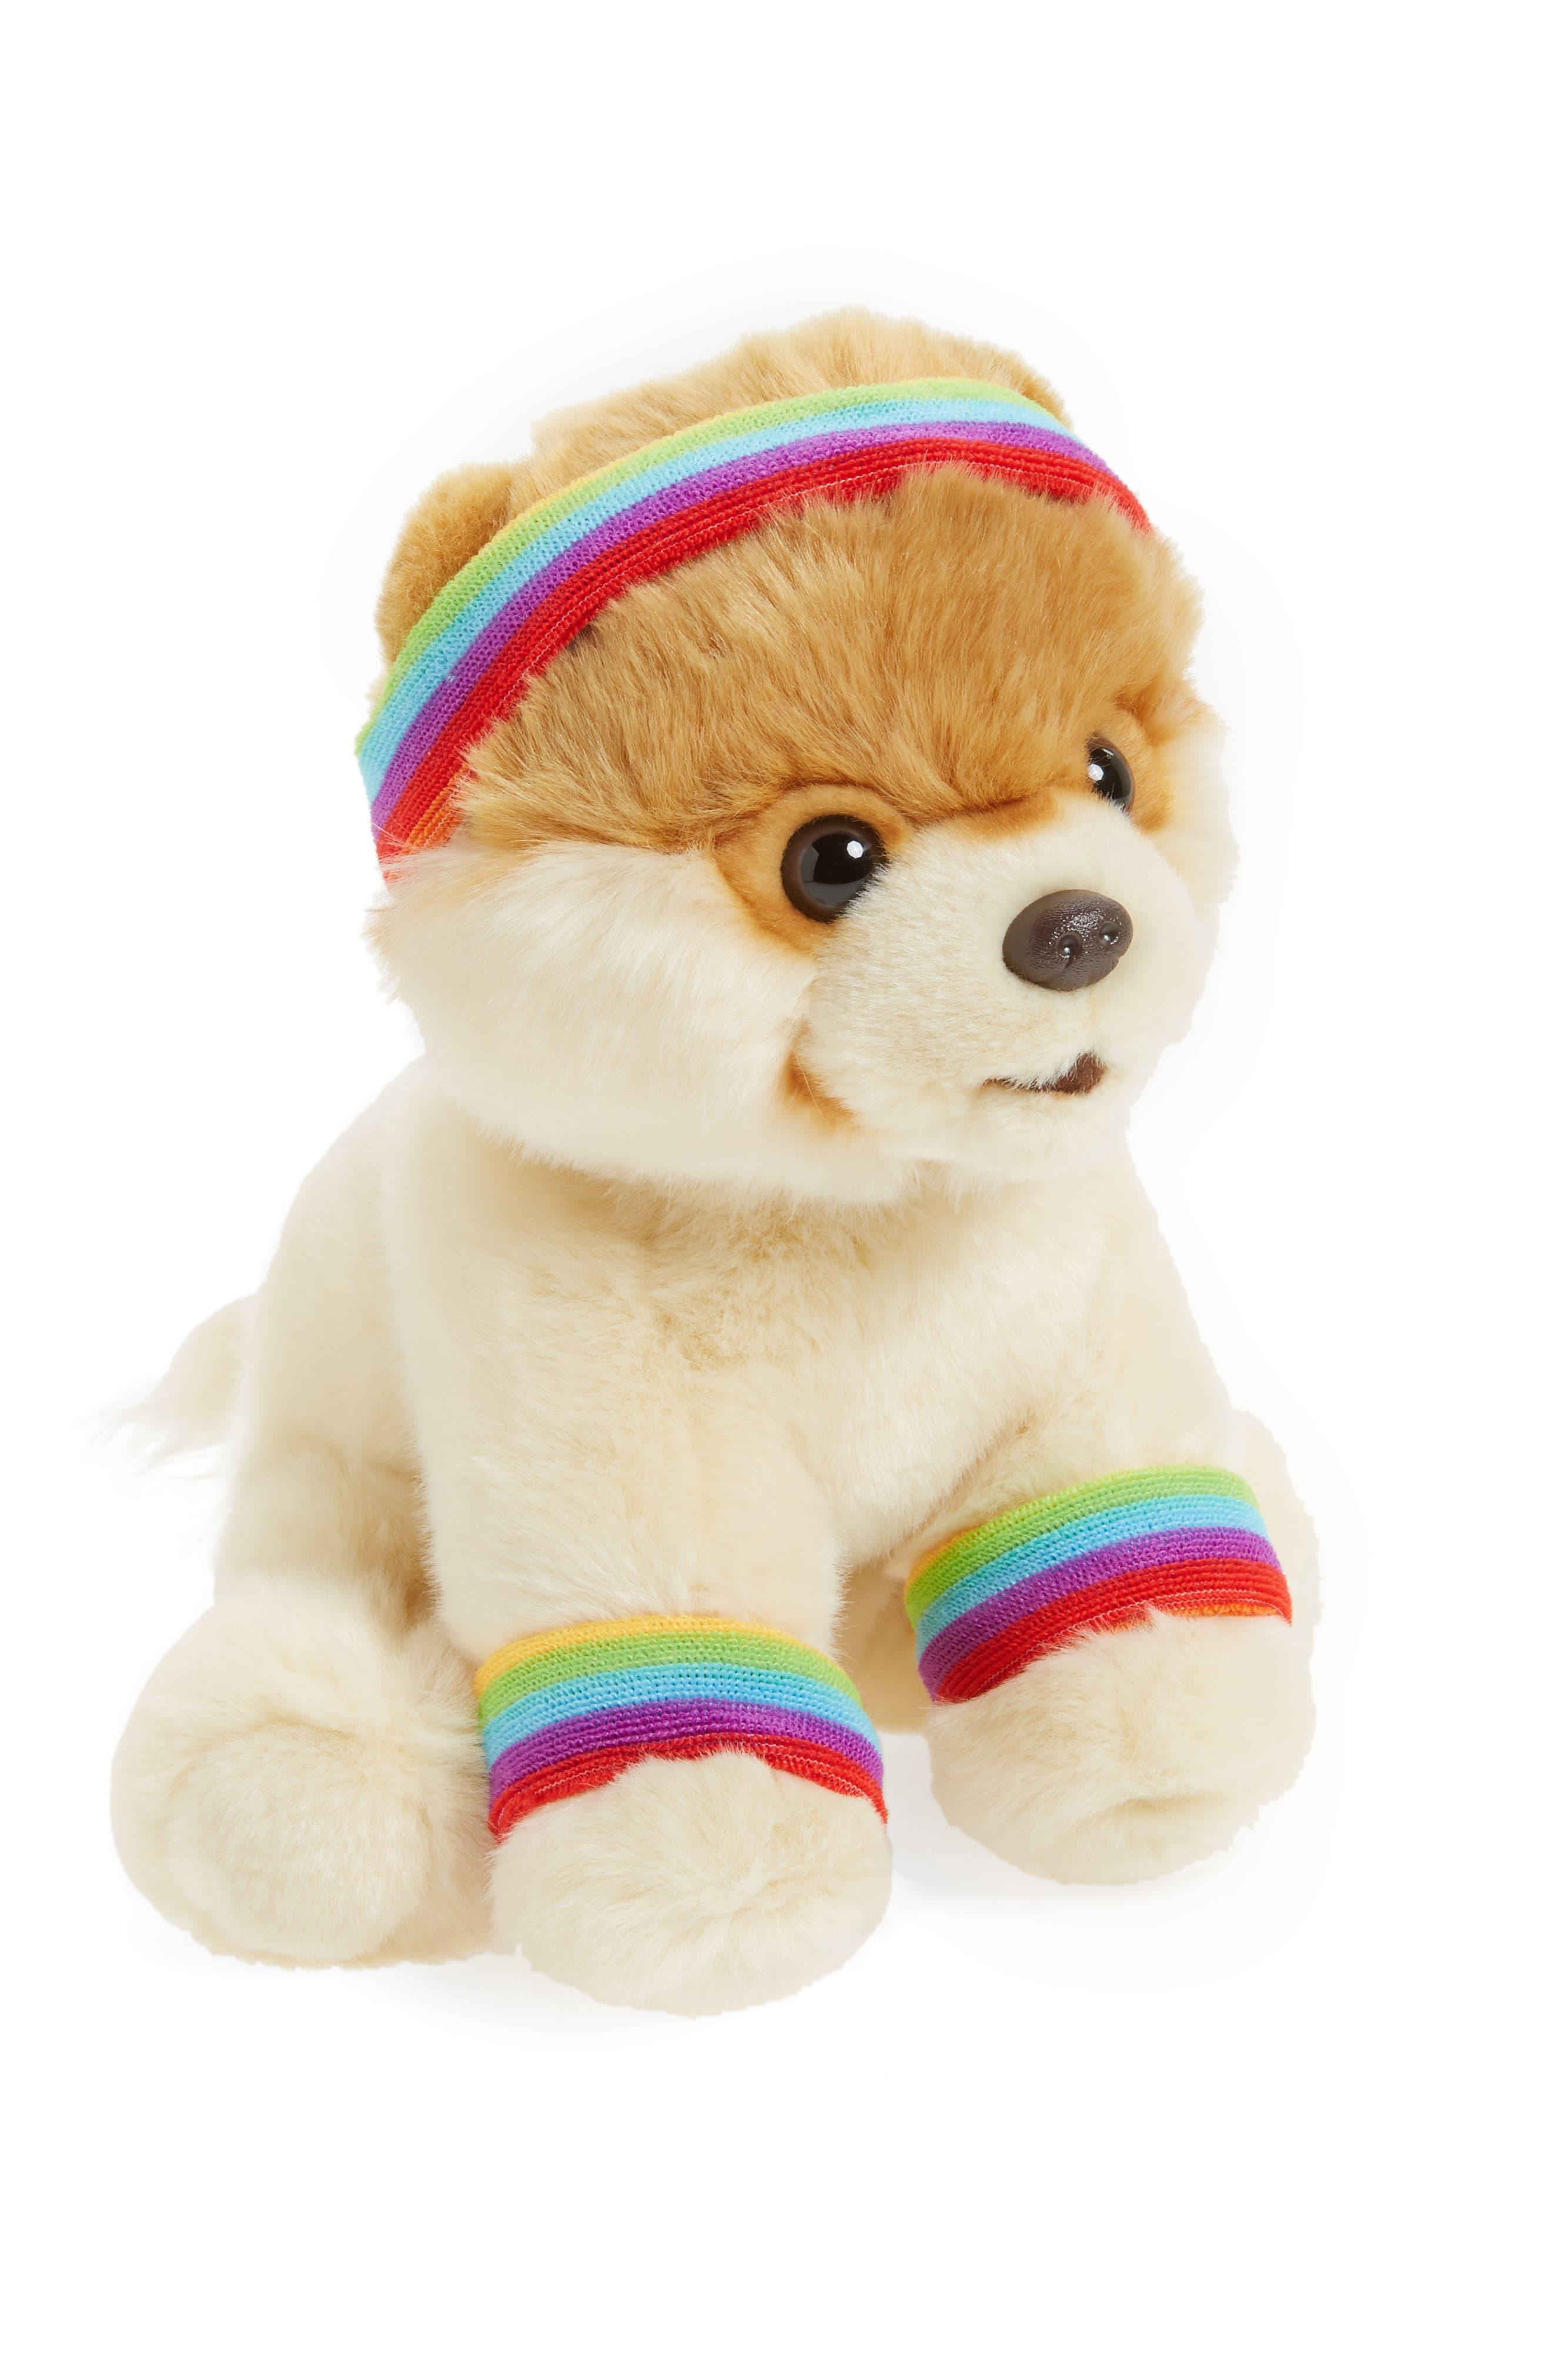 Boo - Exercise Stuffed Animal,                             Main thumbnail 1, color,                             Tan